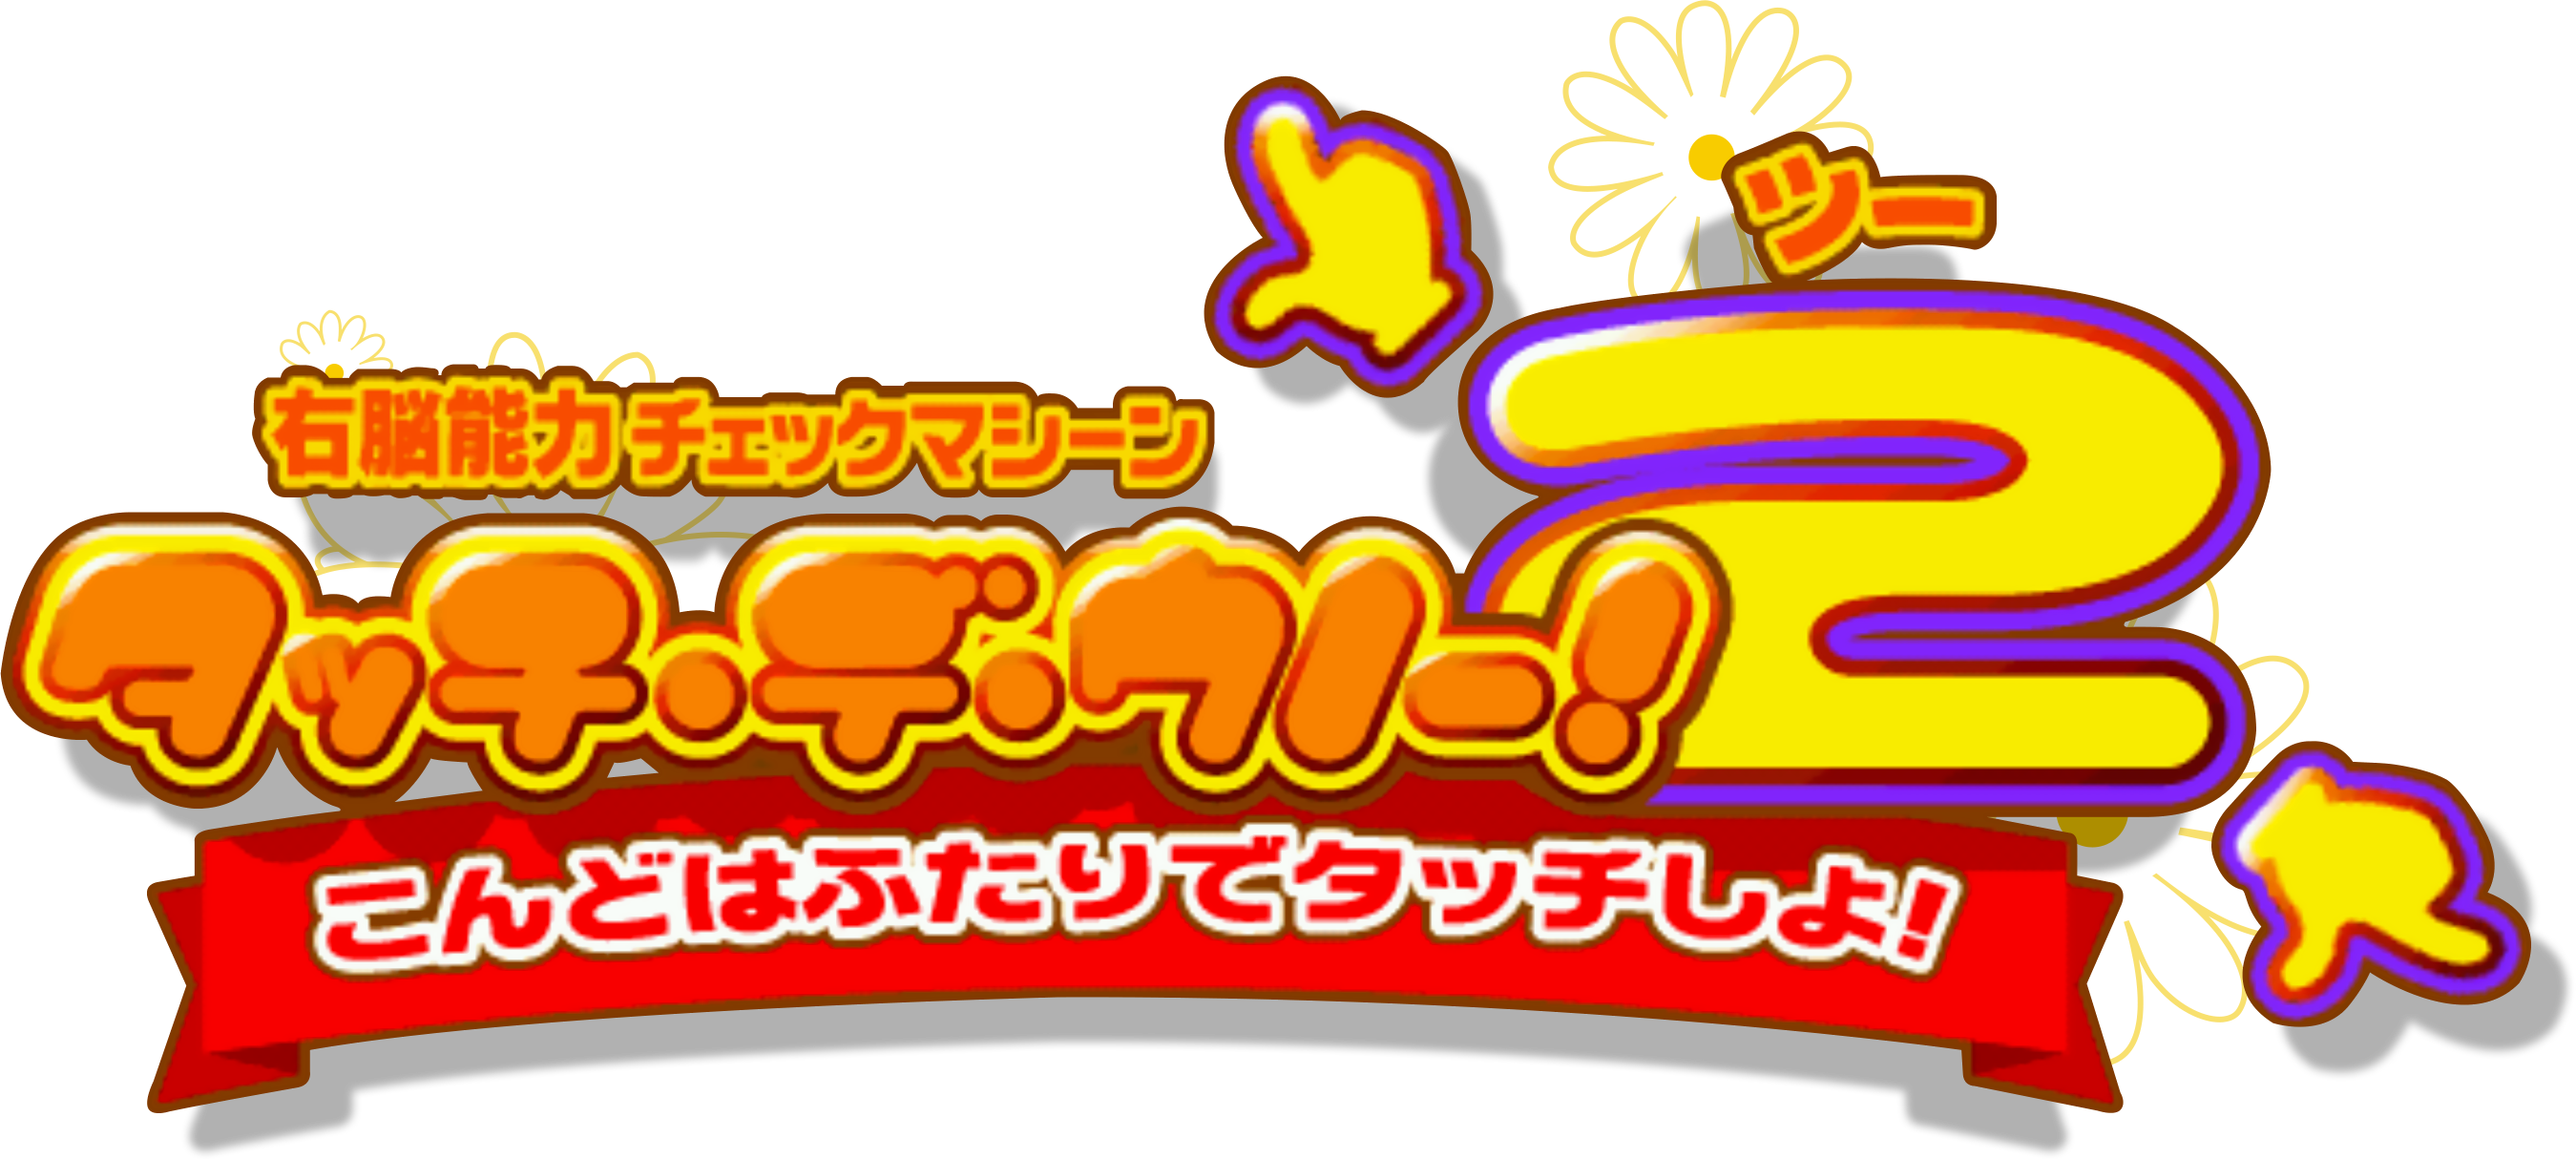 Sega naomi clipart image transparent download Sega Naomi/Logo – tduno2 Touch De Uno! 2 – diskmach\'s Game Art image transparent download